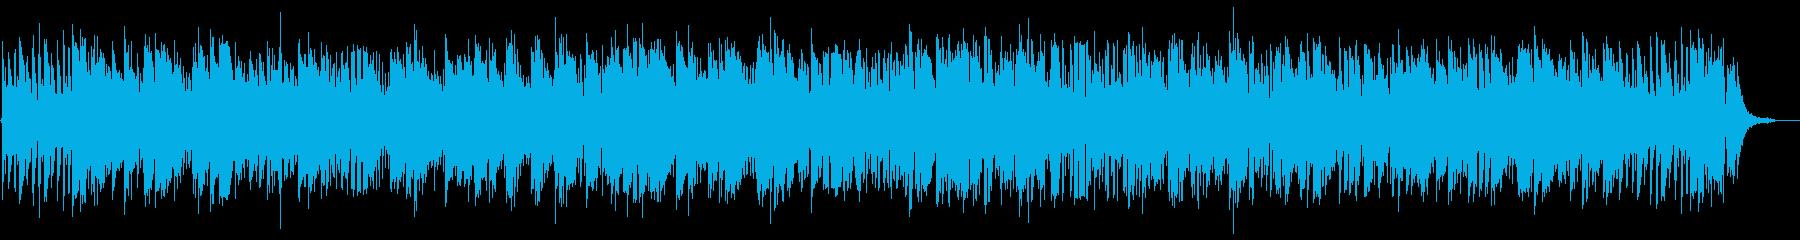 Piano Sonata 8th 2nd movement Jazz's reproduced waveform